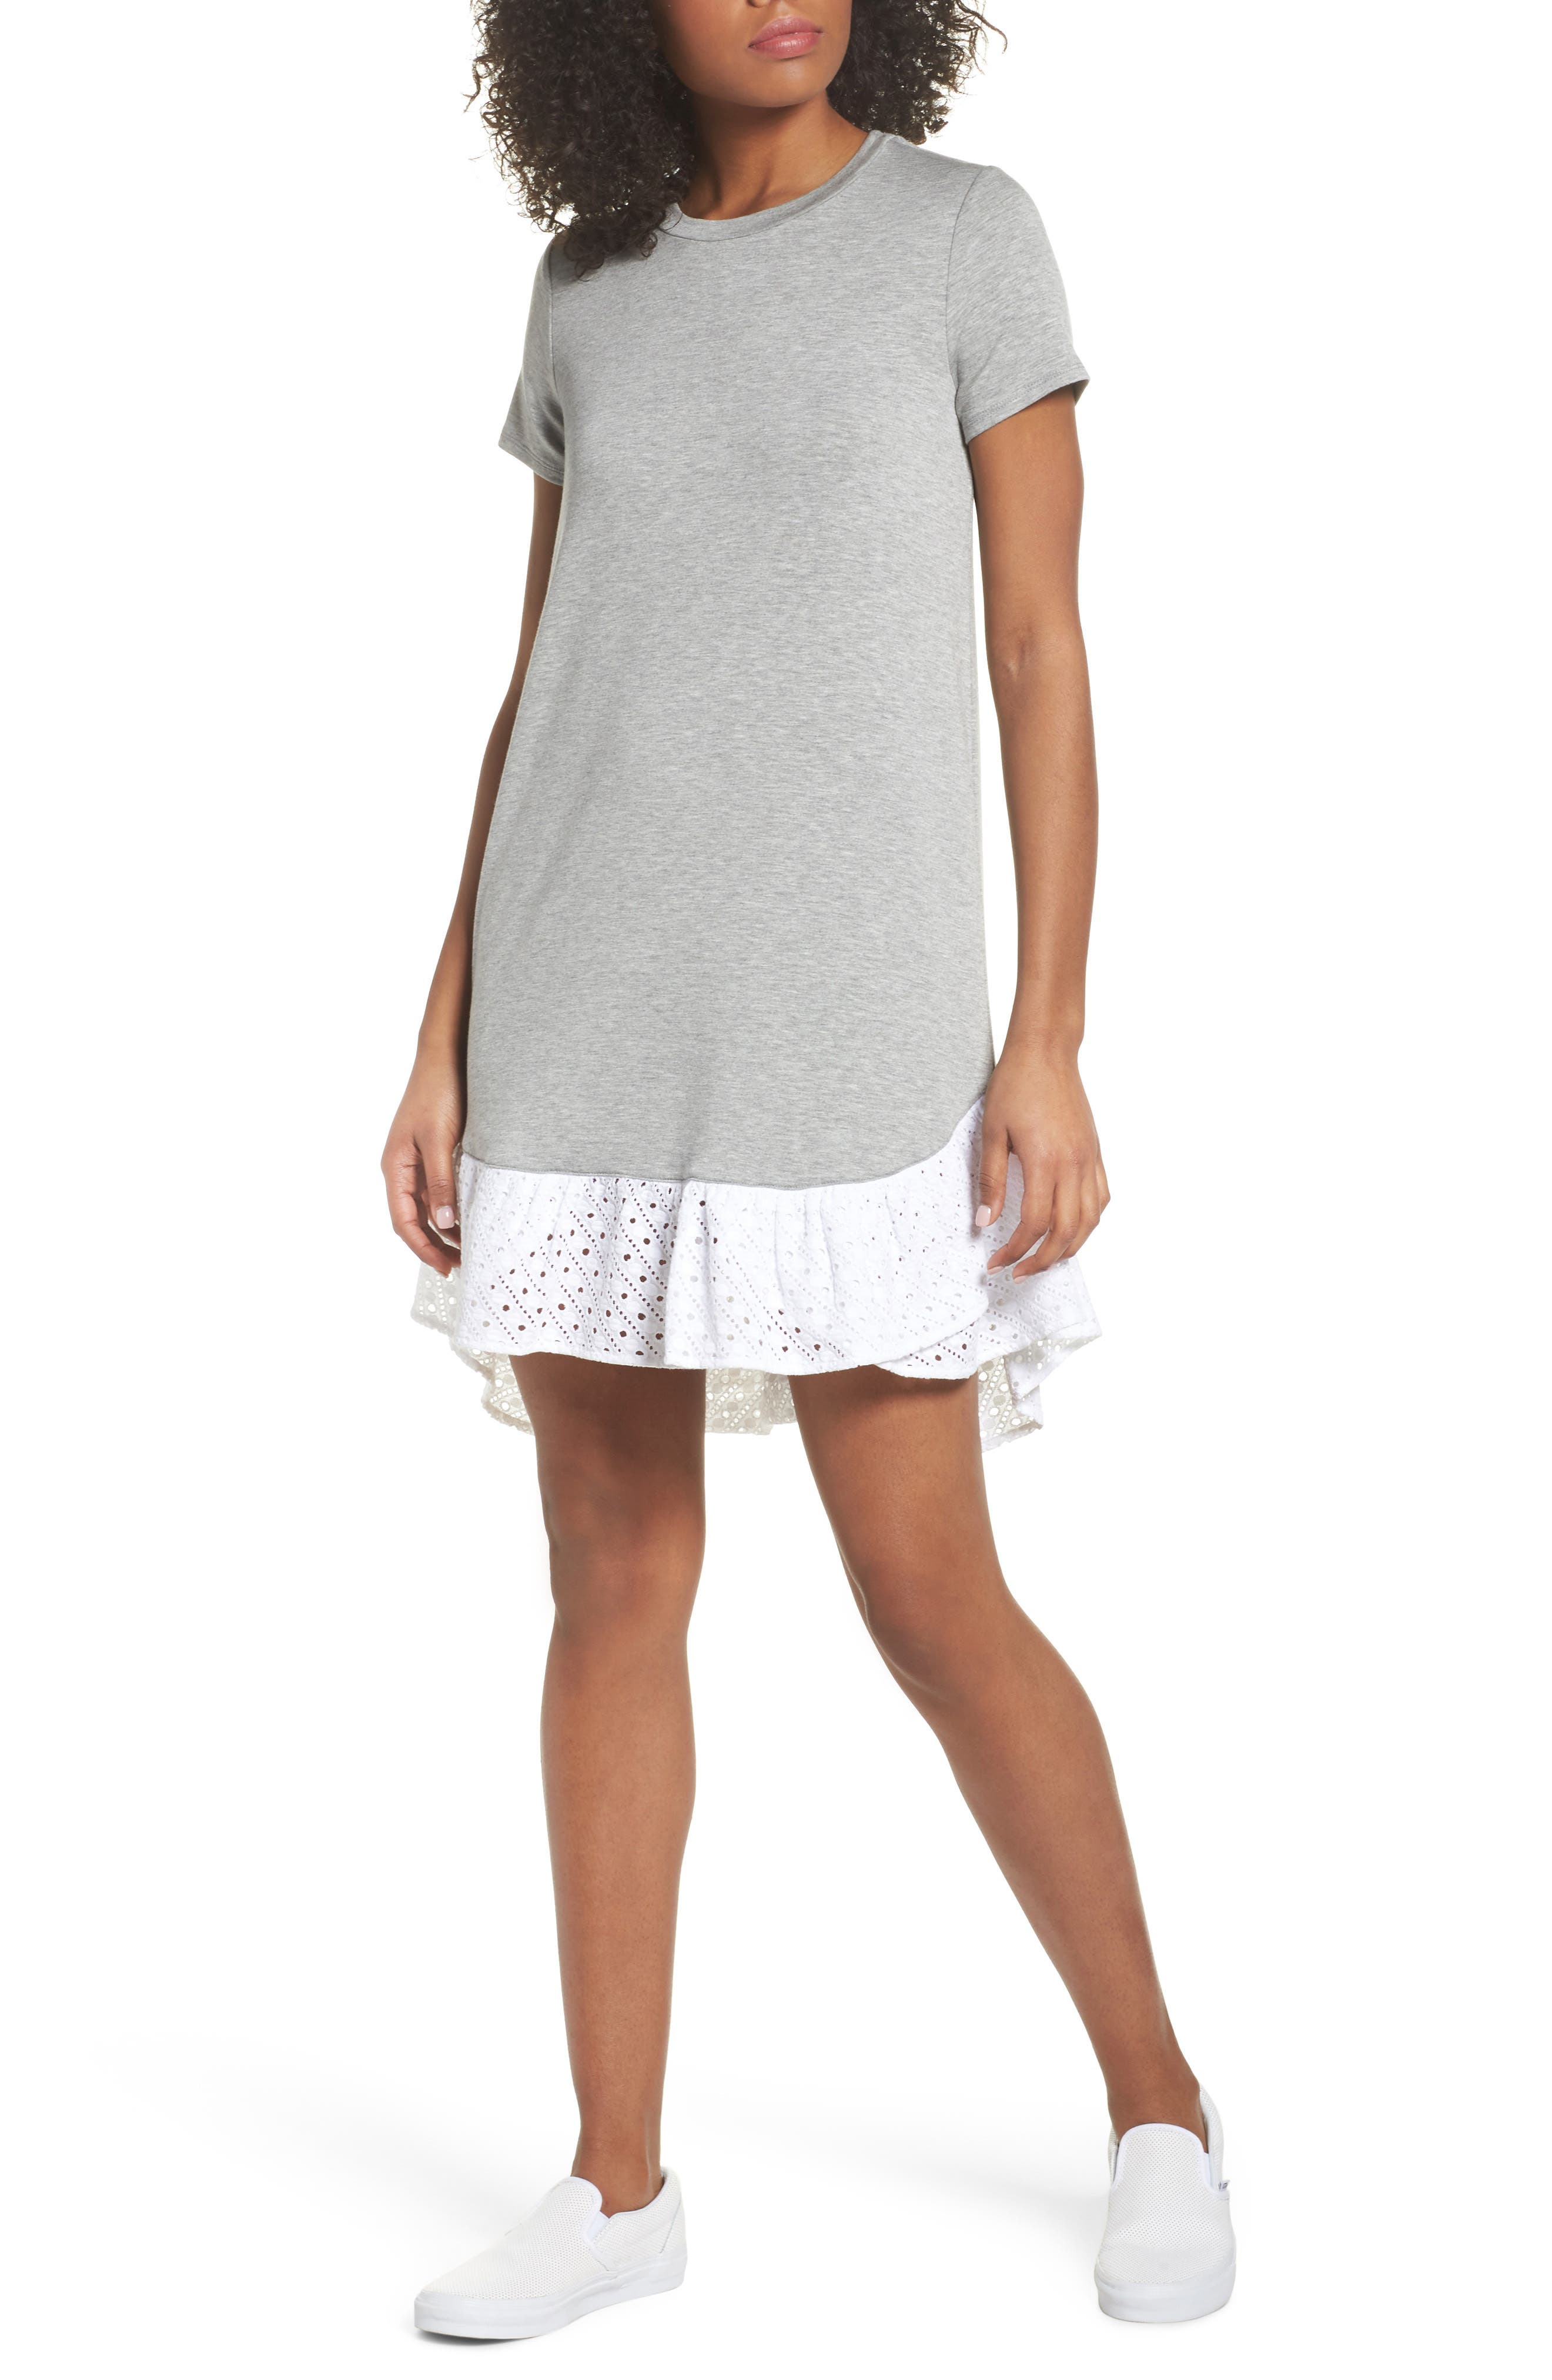 Alternate Image 1 Selected - Chelsea28 Eyelet Trim T-Shirt Dress